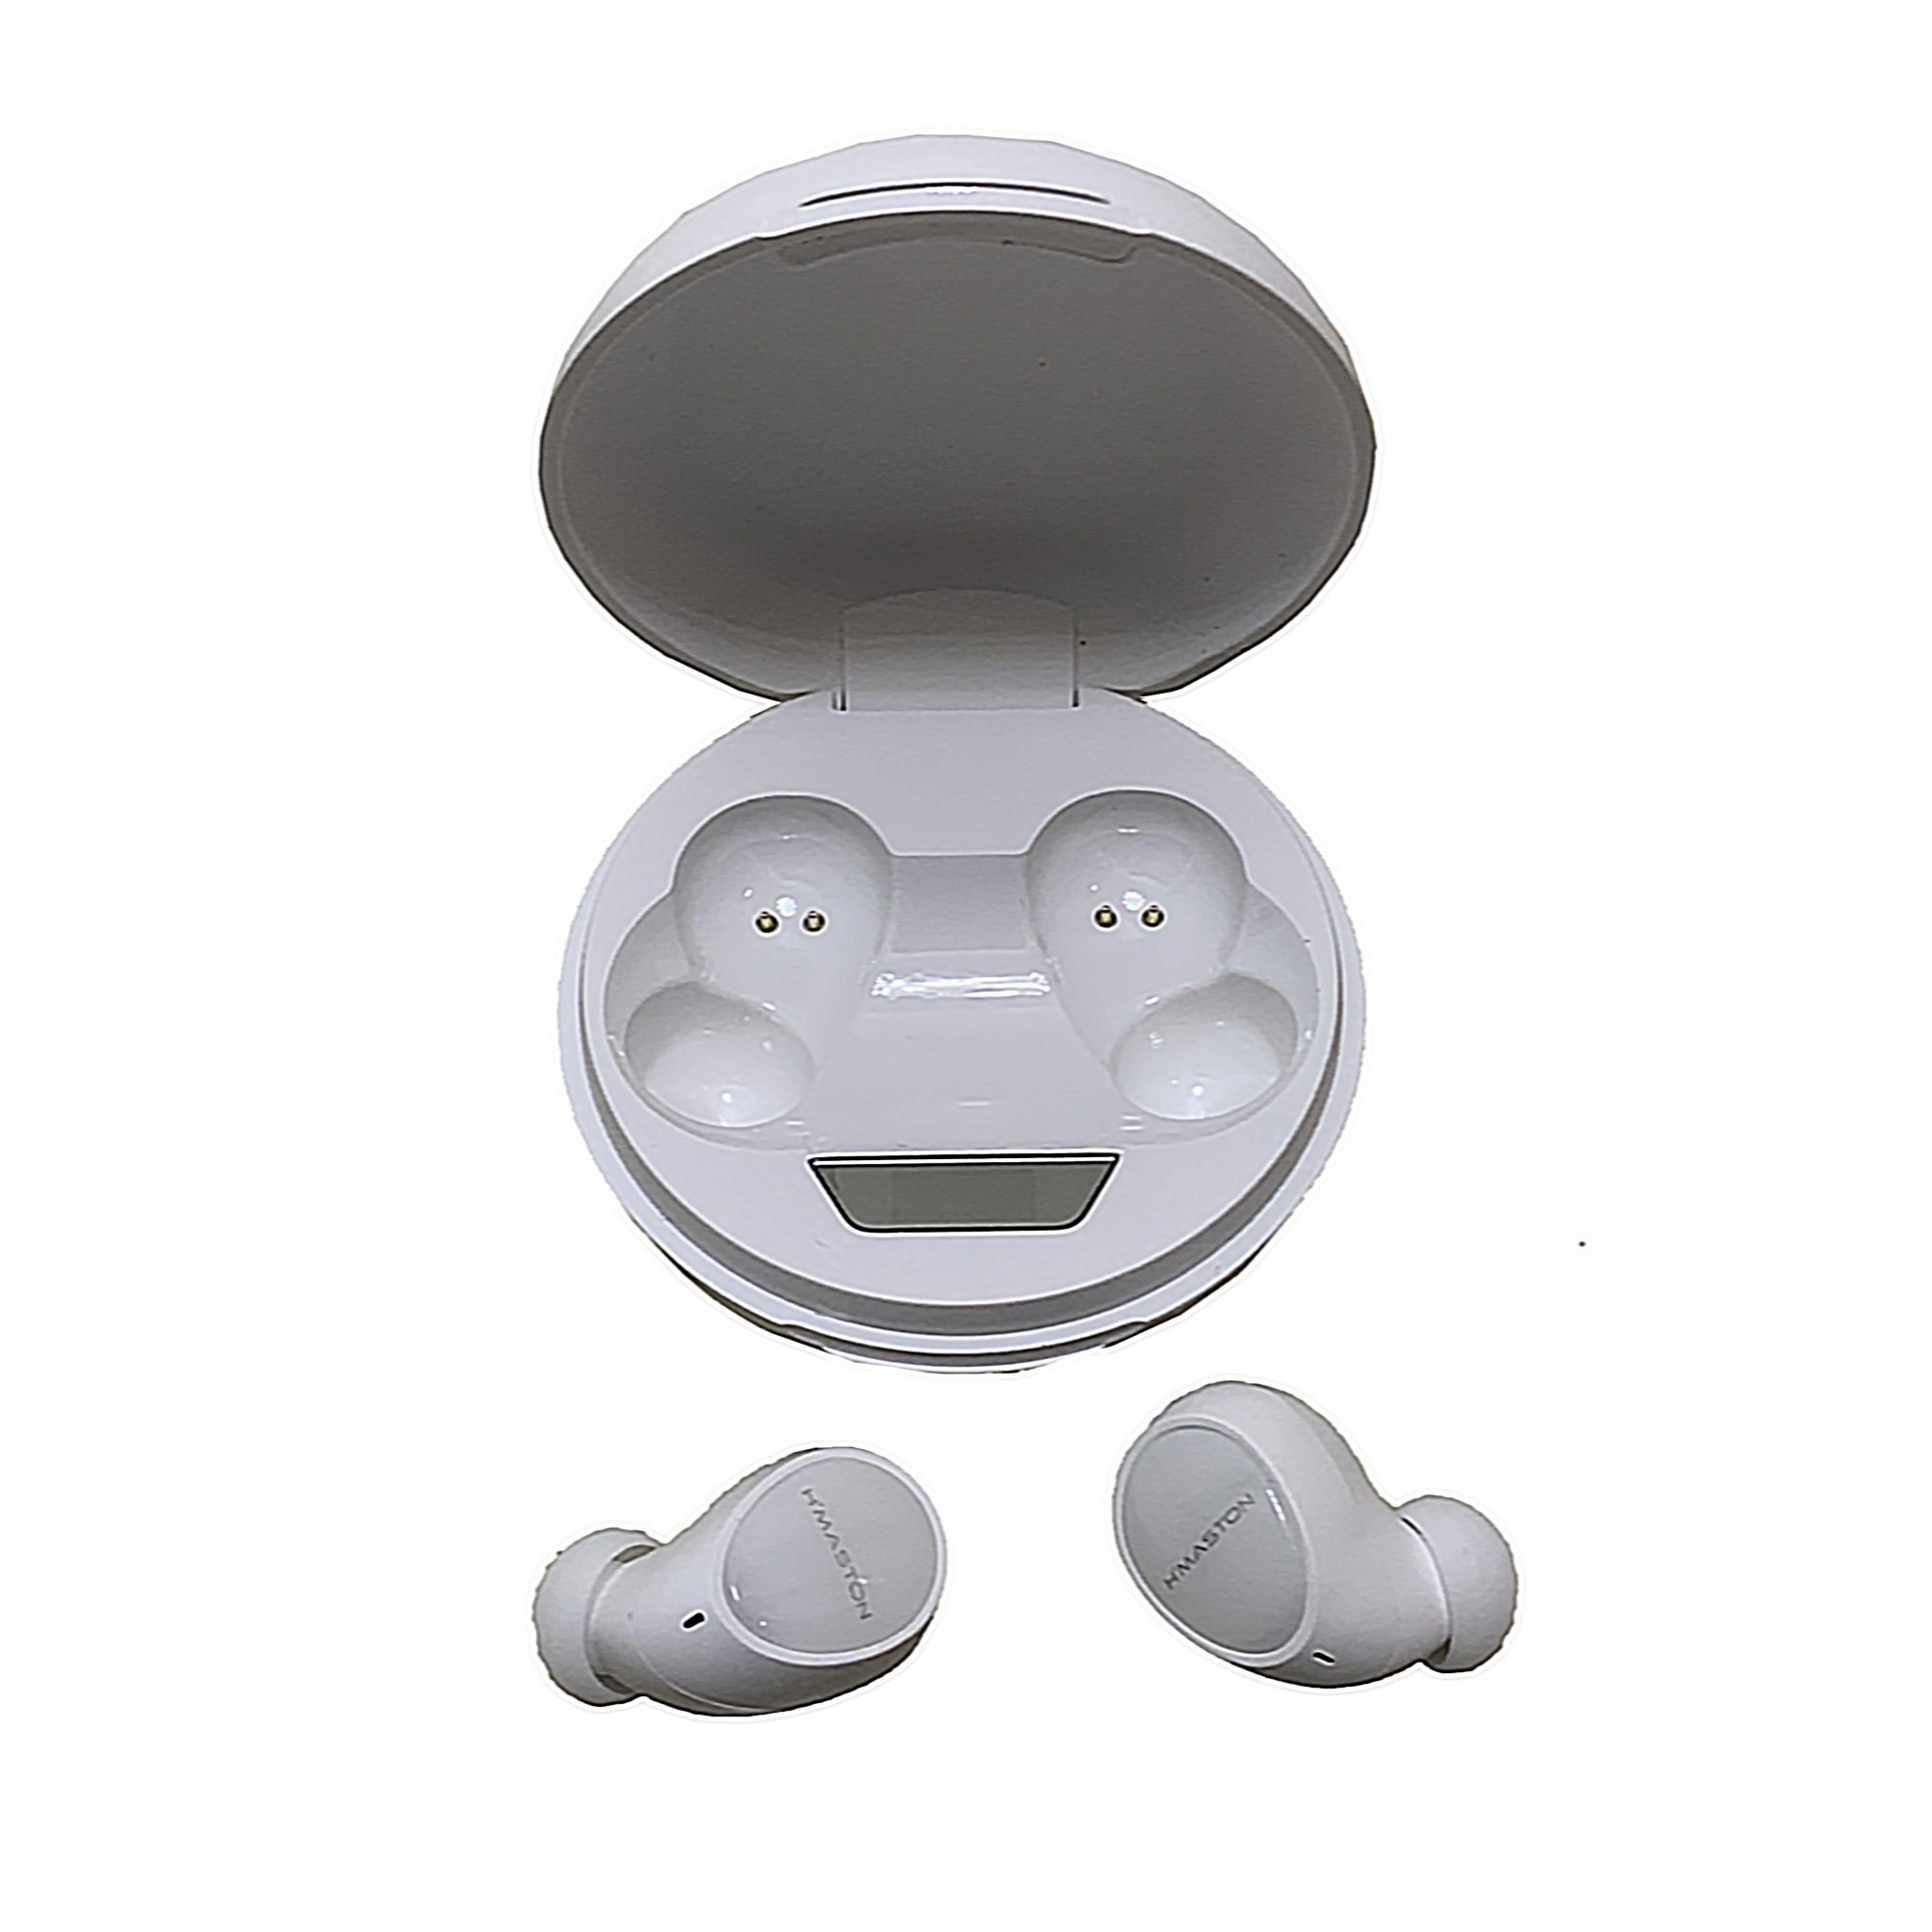 Fone Bluetooth Sem Fio Hmaston Ly-107 Touch Display De Carga